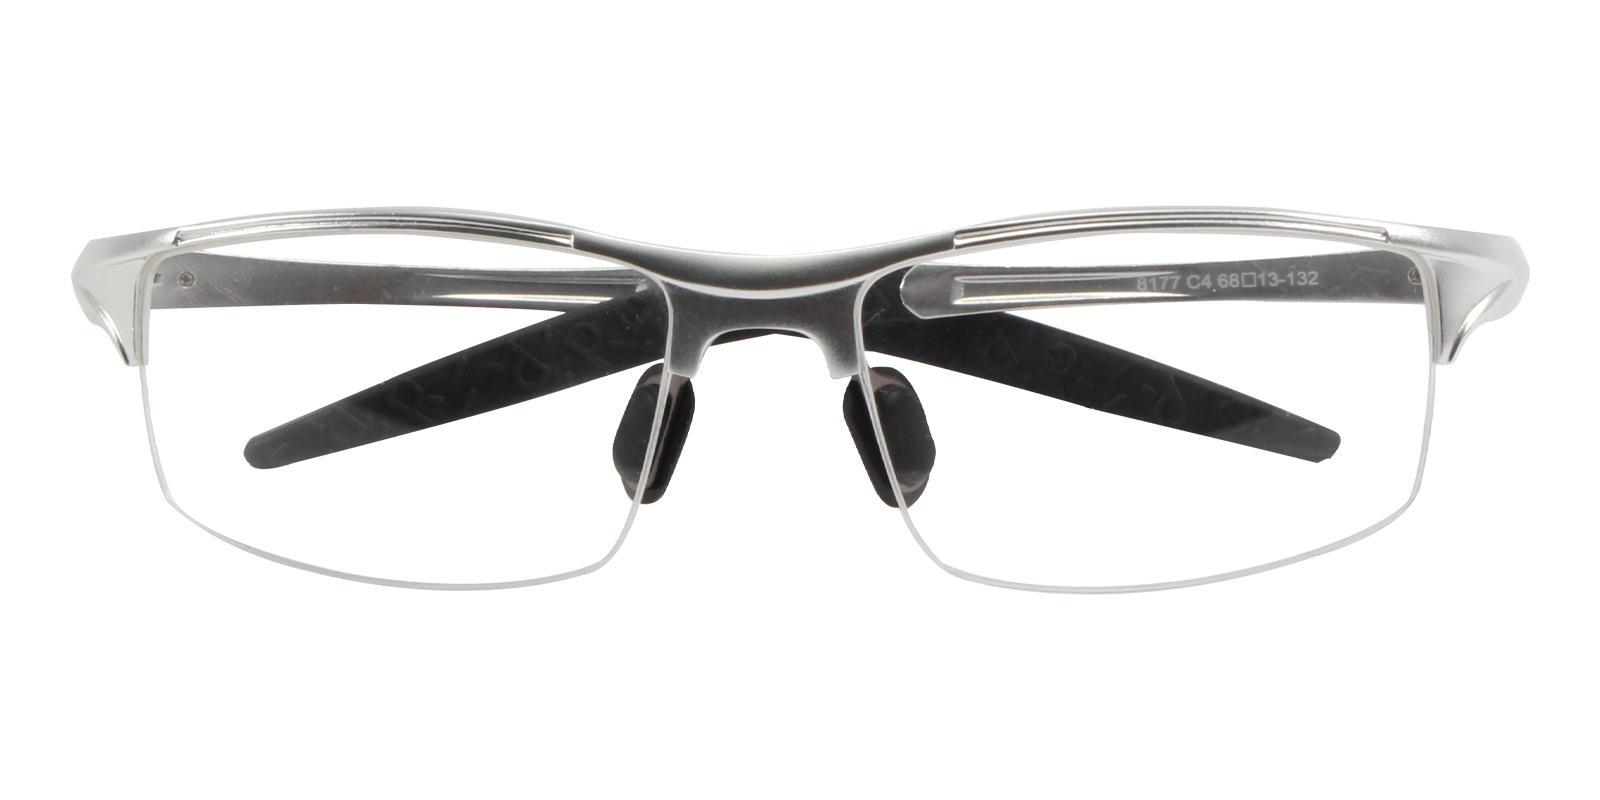 Surveyor Silver Metal NosePads , SportsGlasses , SpringHinges Frames from ABBE Glasses